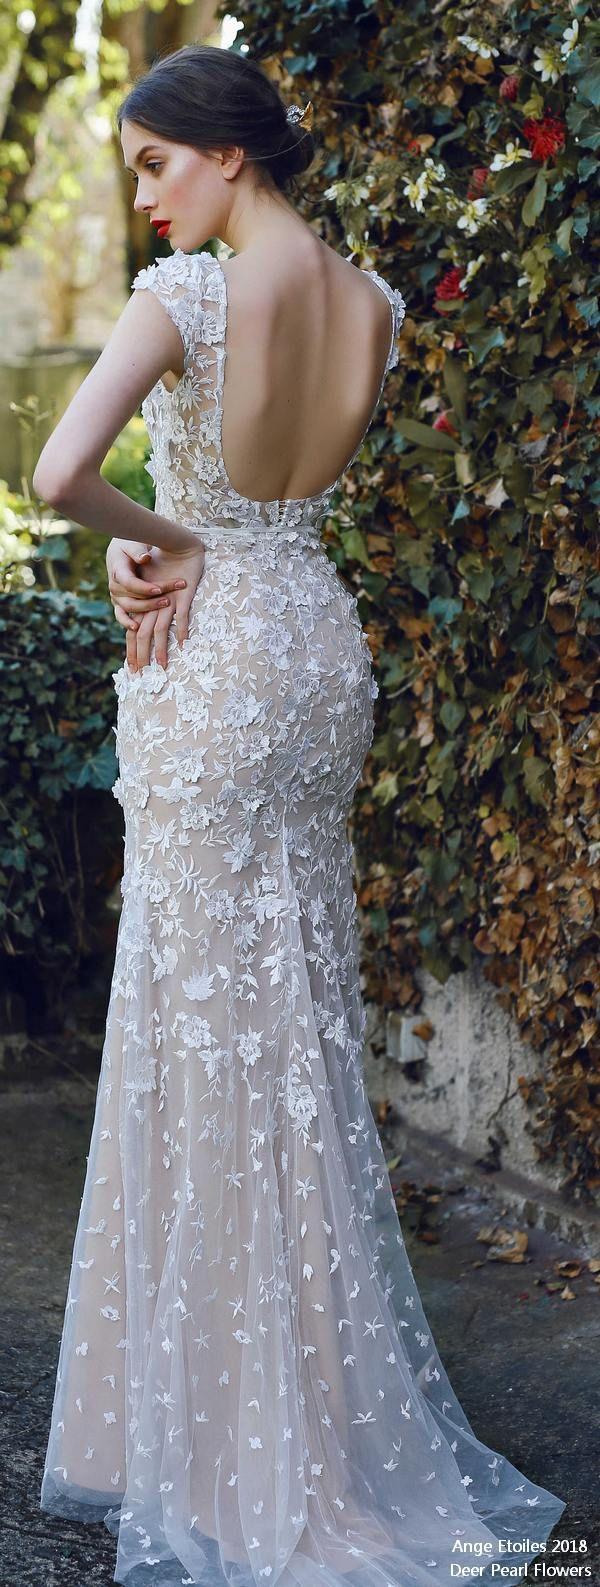 VELARI lace wedding dress  ❤️ bridaldress #weddinggowns #weddingdresses http://www.deerpearlflowers.com/ange-etoiles-2018-wedding-dresses/